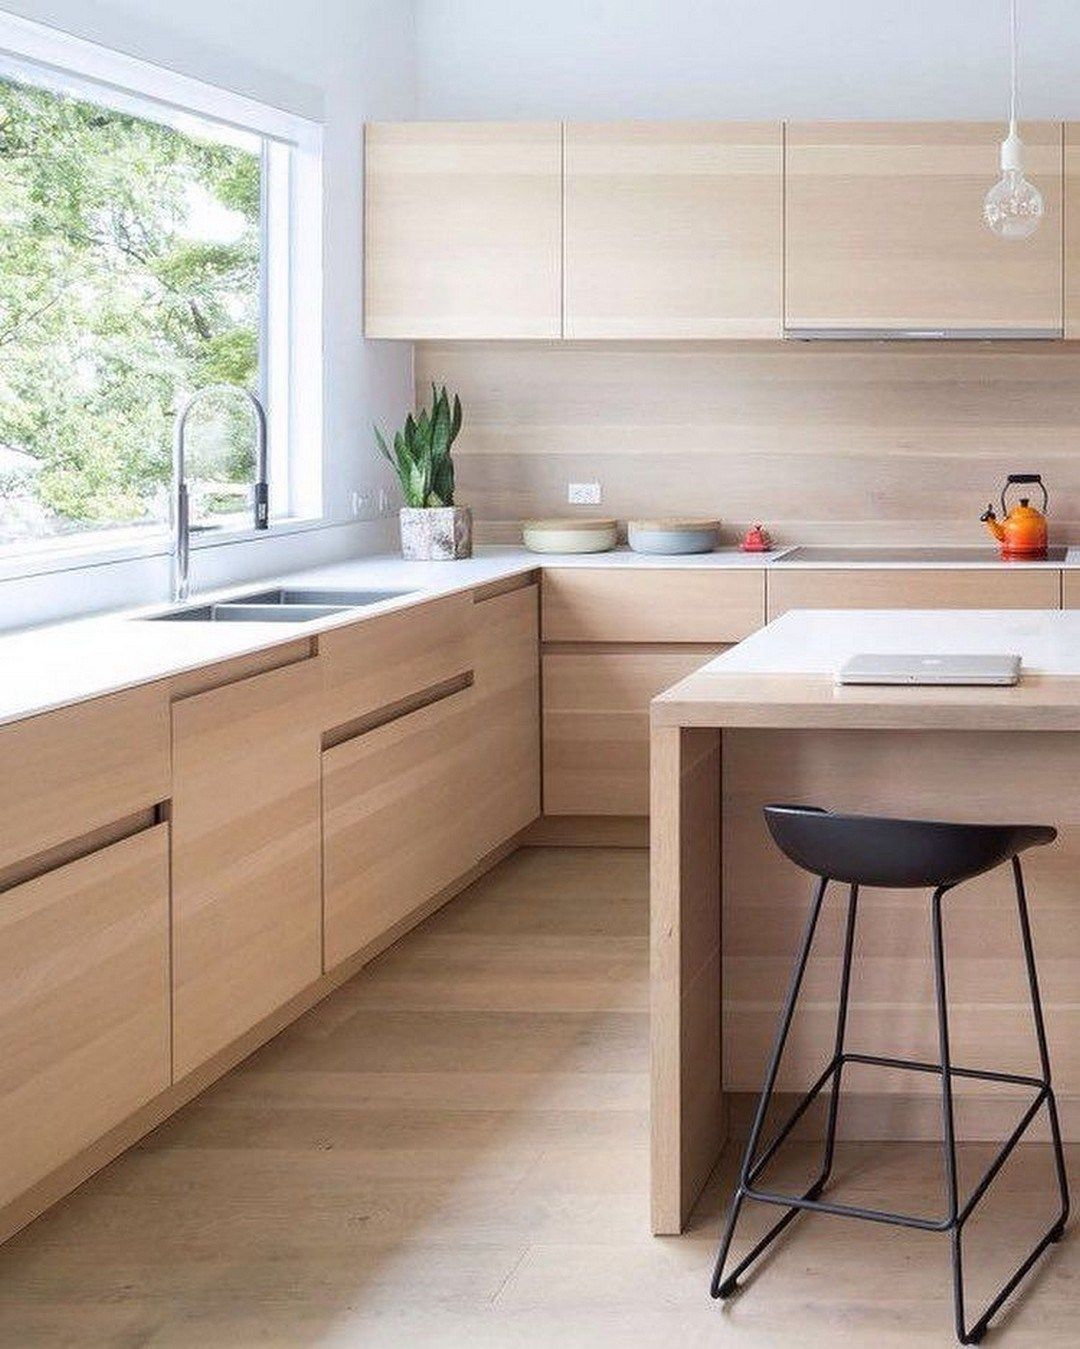 29 Design Combinations For A Modern Kitchen 10 Cocina Blanca Y